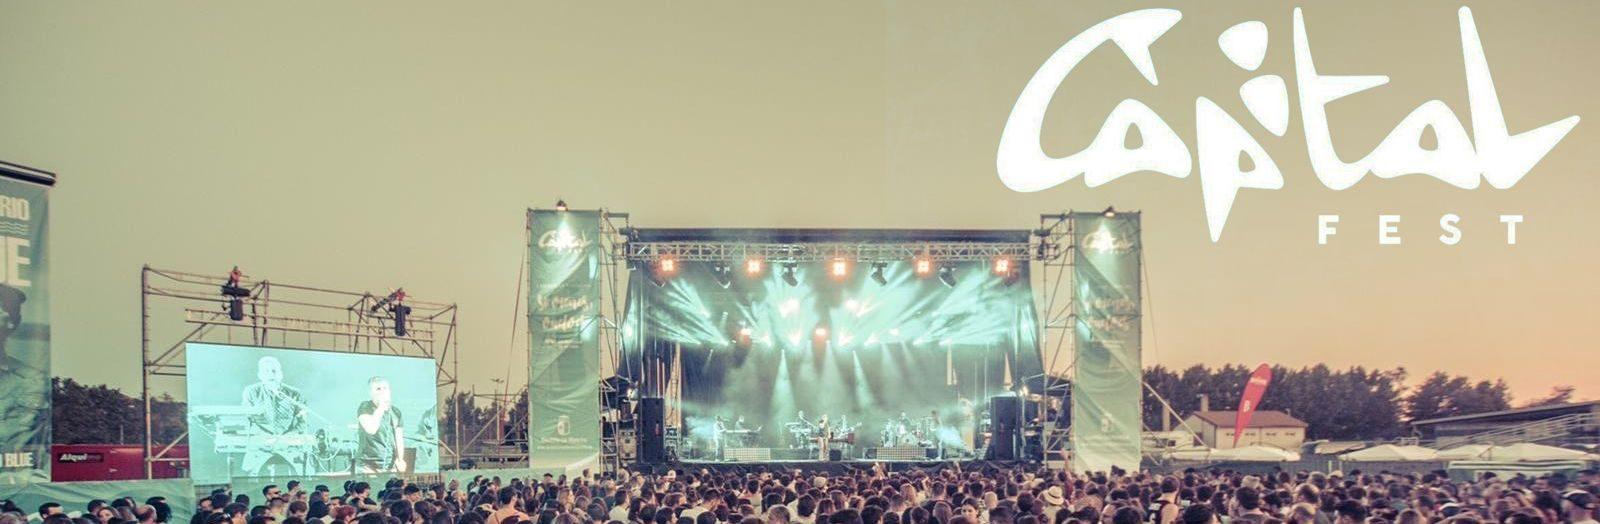 Capital Fest 1